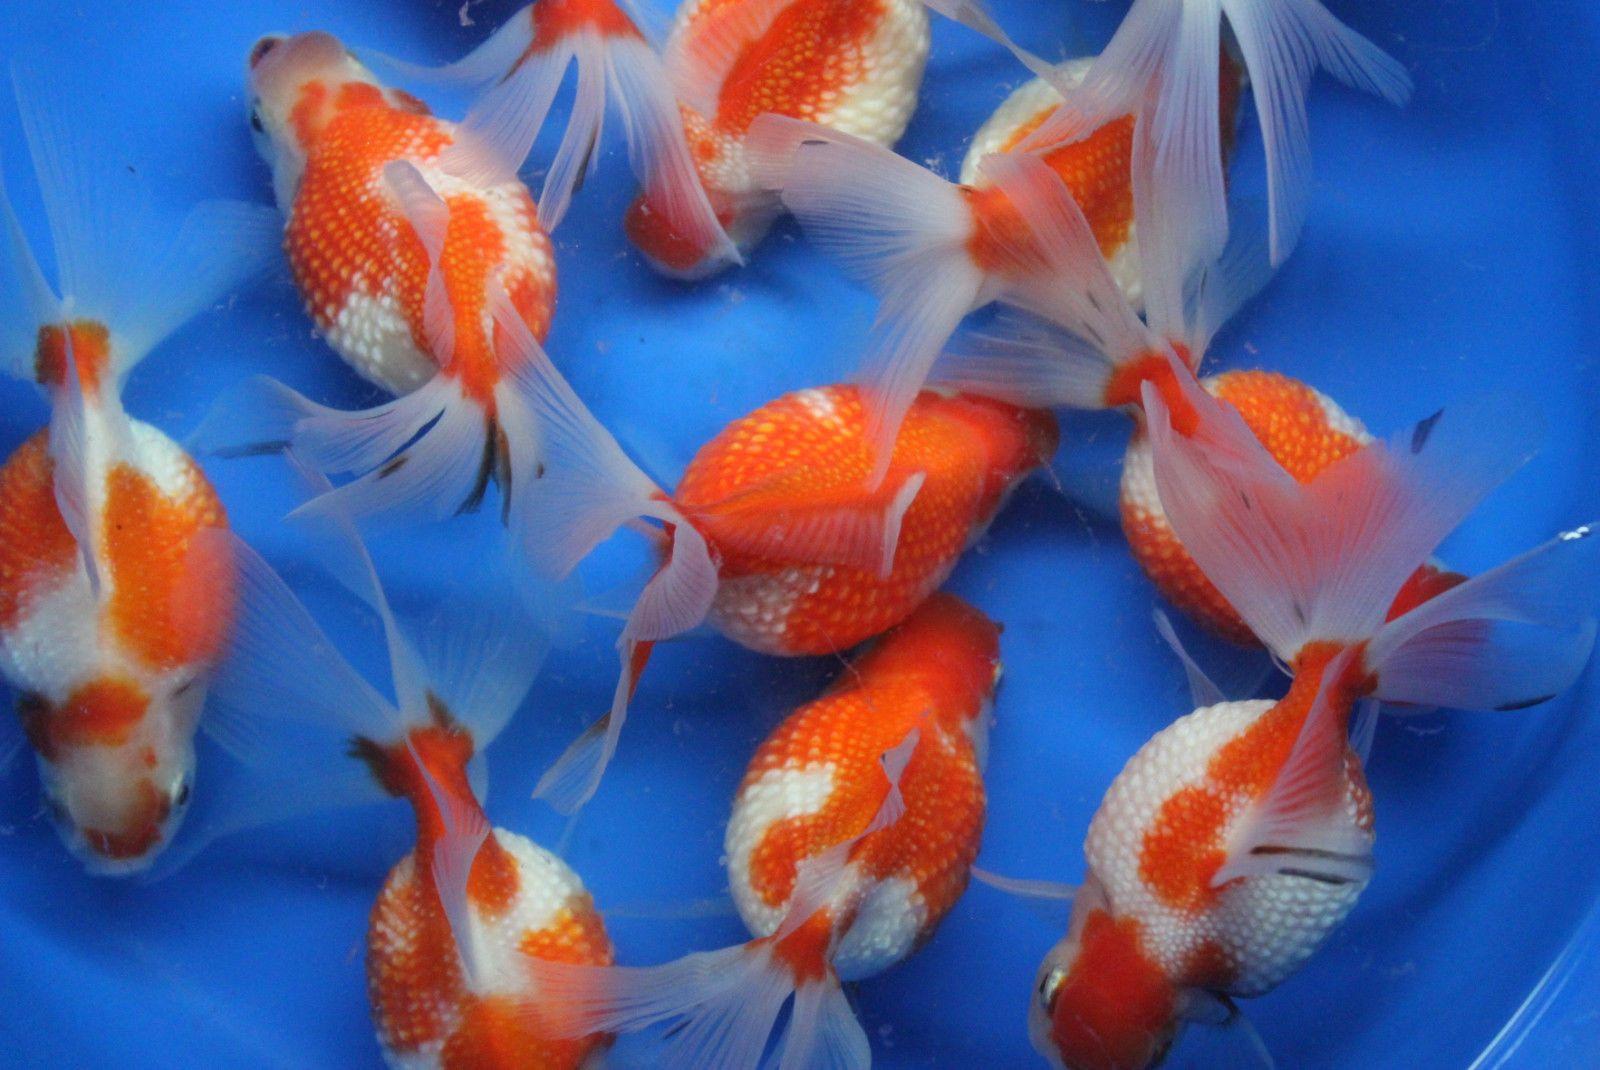 Live Crown Pearlscale Goldfish Md For Fish Tank Koi Pond Or Aquarium Ebay Goldfish Koi Fish Pond Fish Ponds